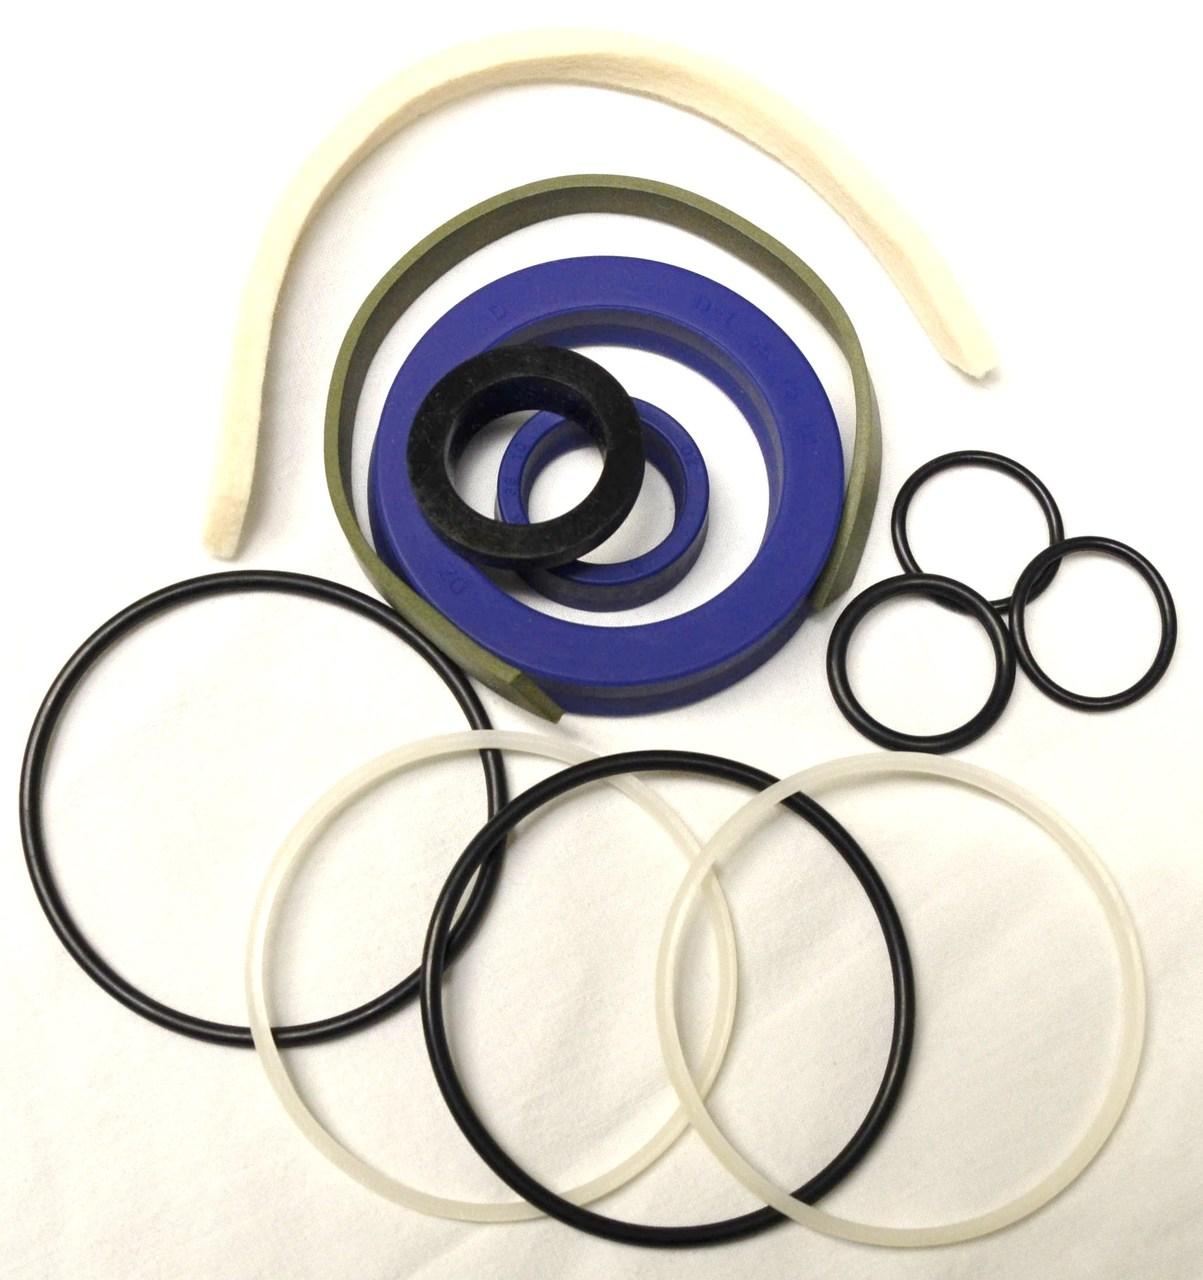 Direct-Lift Cylinder Seal Kit for Lift Models Pro-Park 7, Pro-Park 8 and Pro-Park 8 Standard